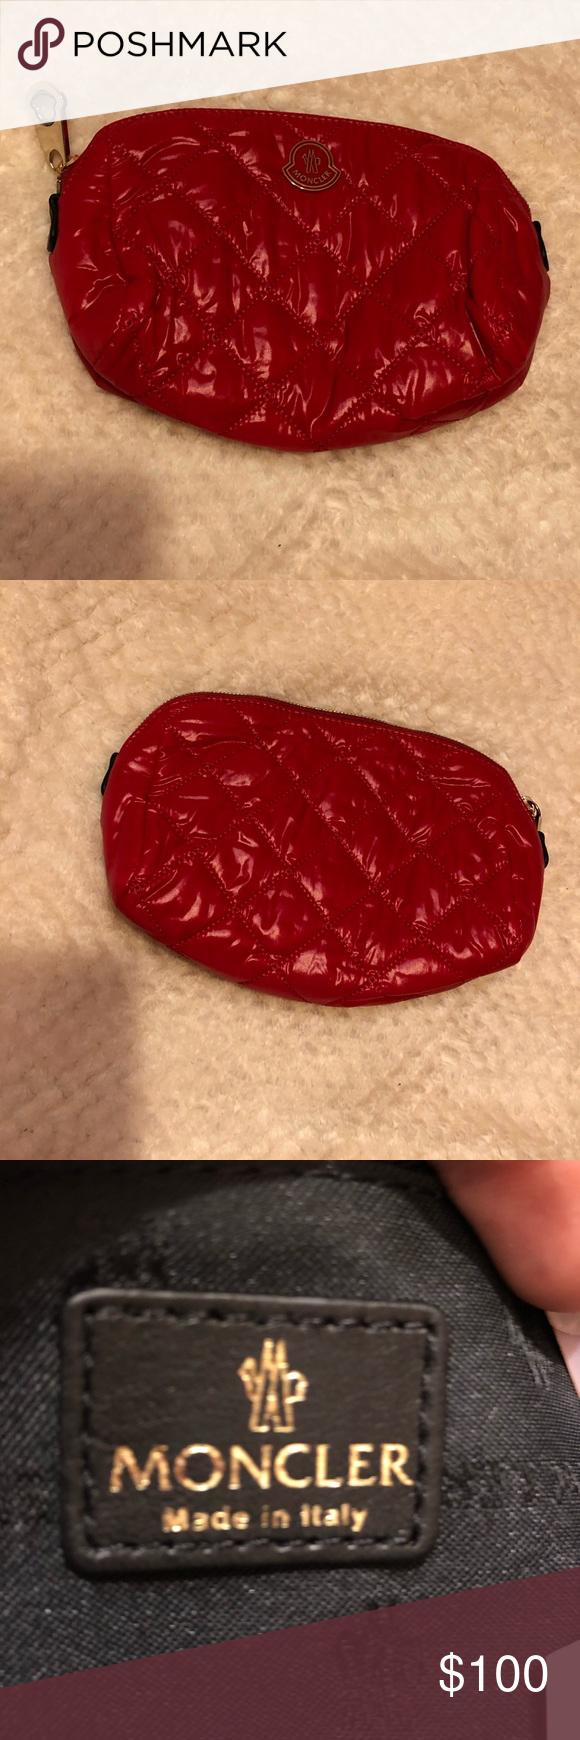 Moncler Cosmetic bag | Cosmetic bag, Moncler, Cosmetics